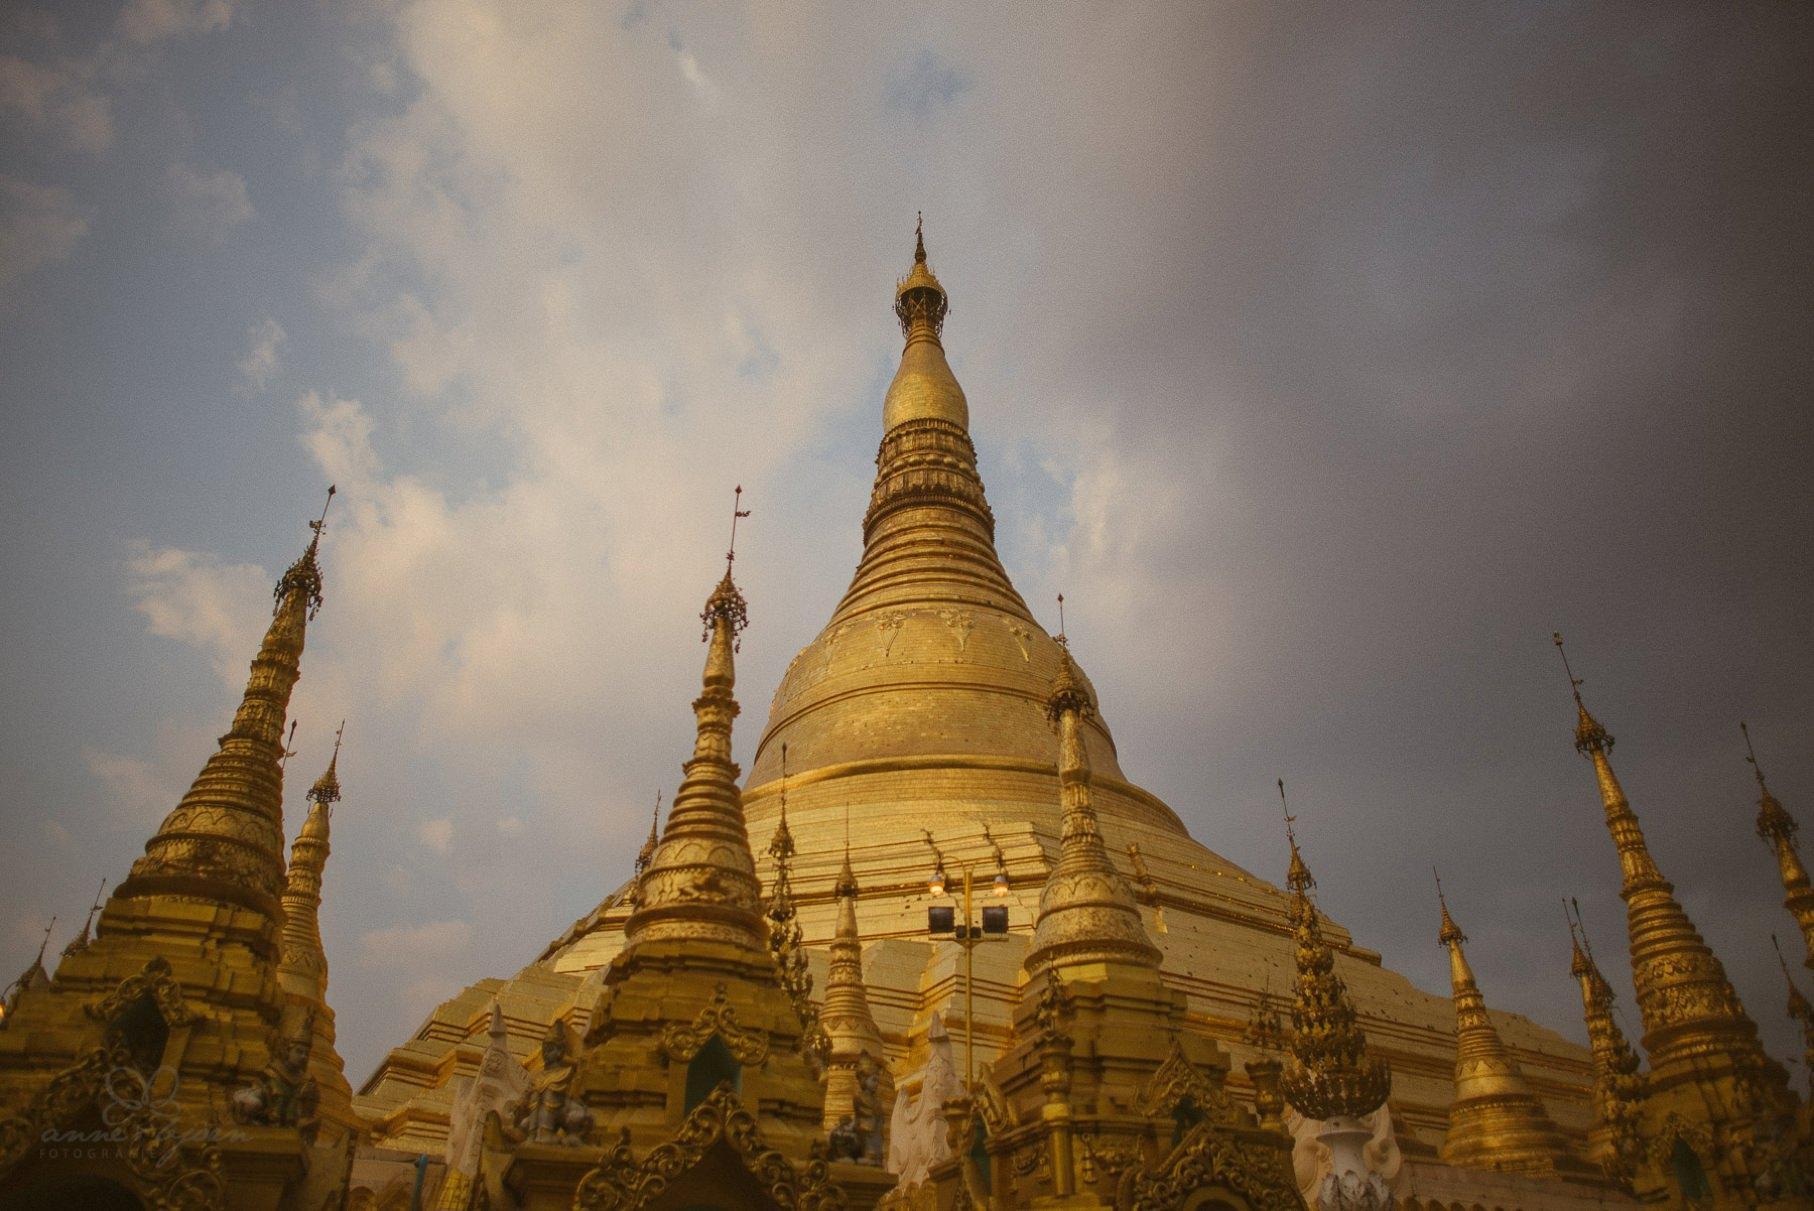 0017 yangon mandalay d76 4532 - Großstädte Myanmars - Yangon & Mandalay